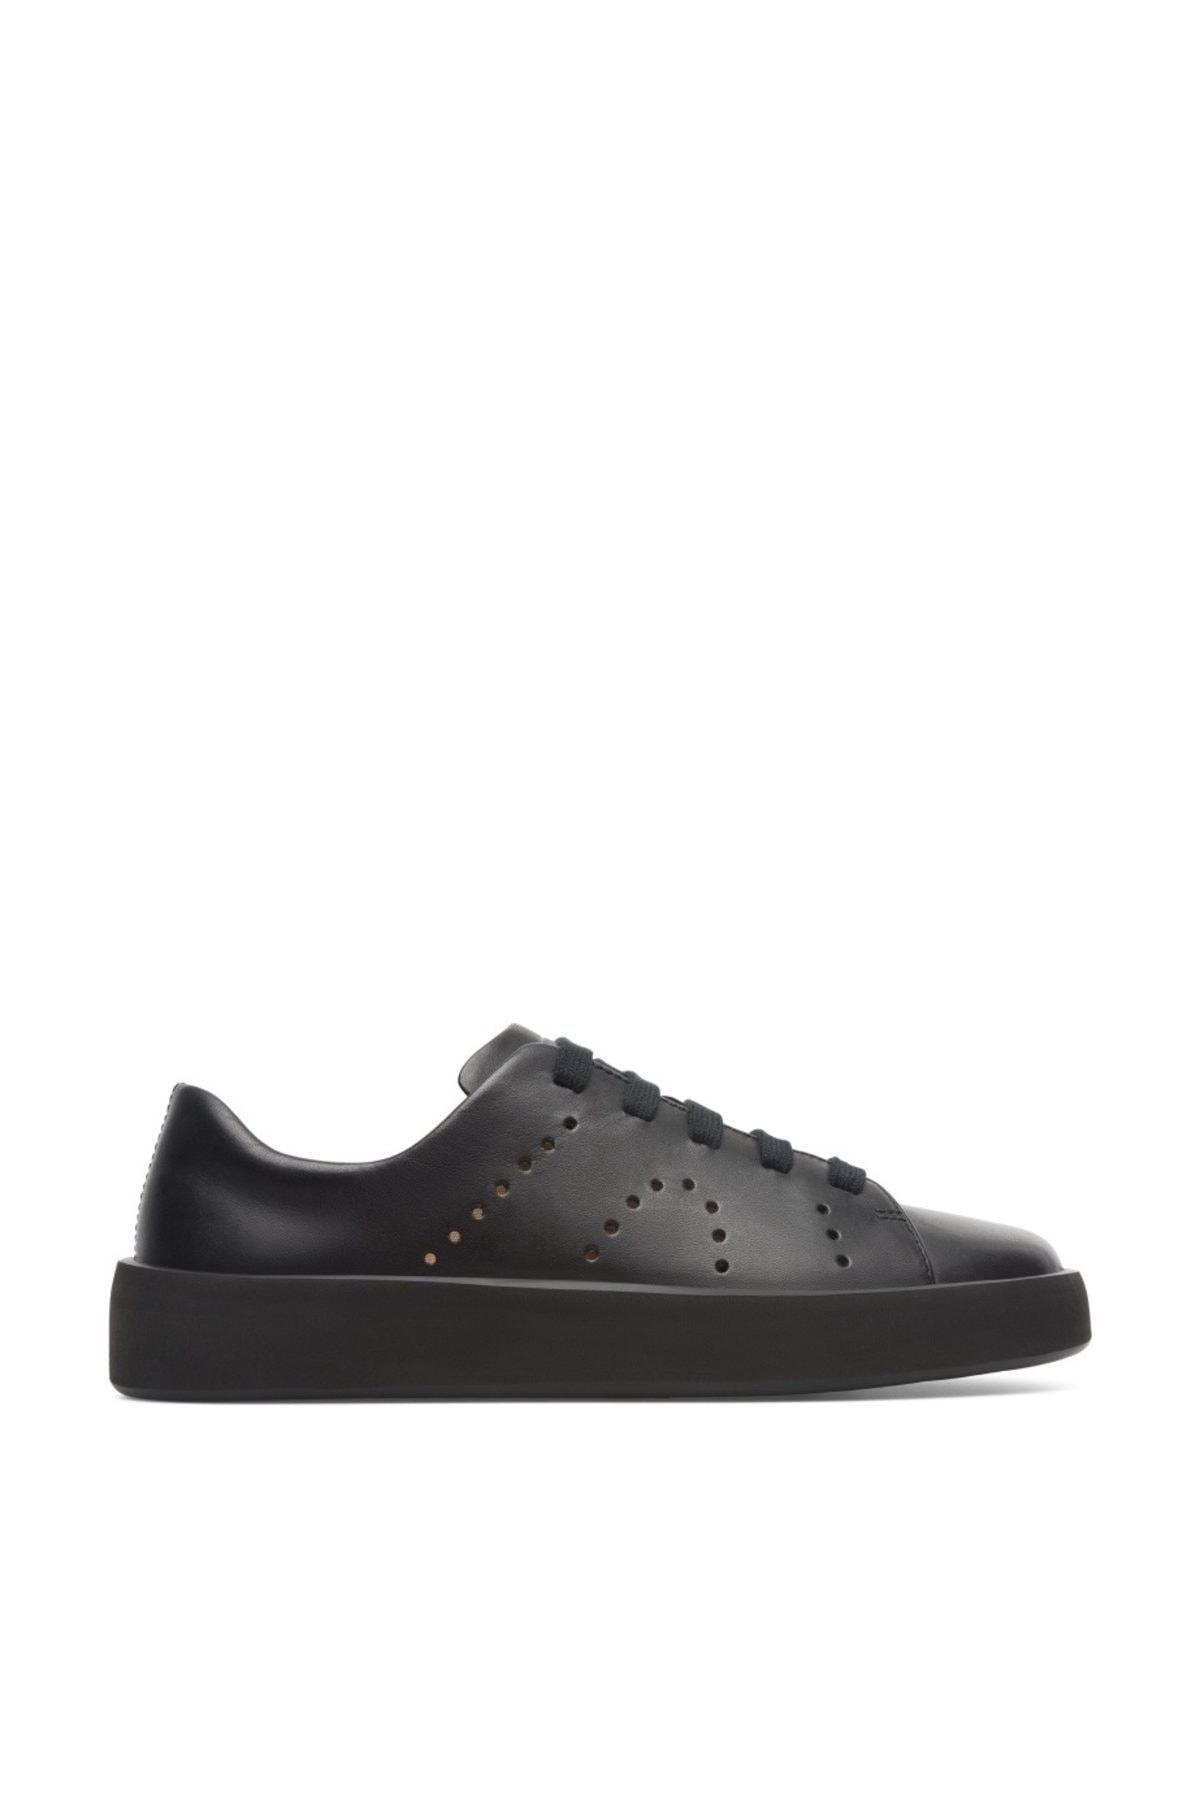 CAMPER Kadın Courb Sneaker K200828-023 1